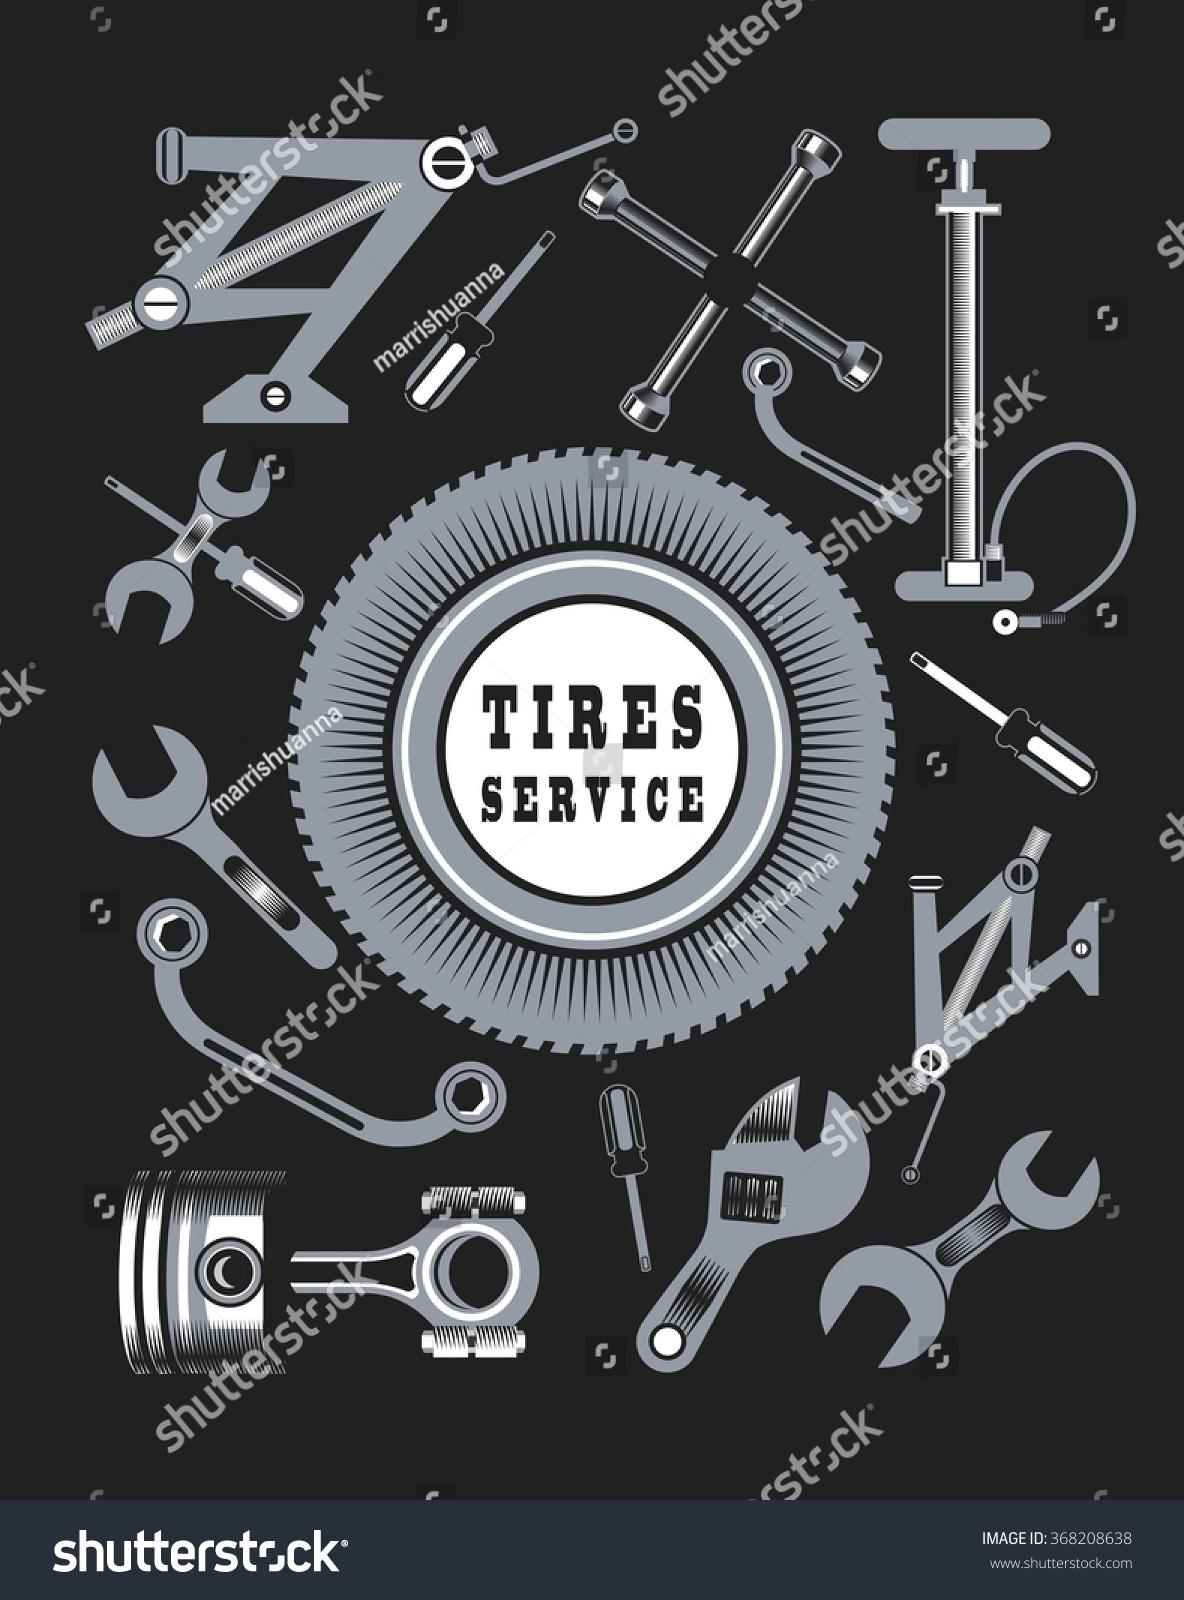 Vector Set Tools Spare Parts Car Stock Vector 368208638 - Shutterstock